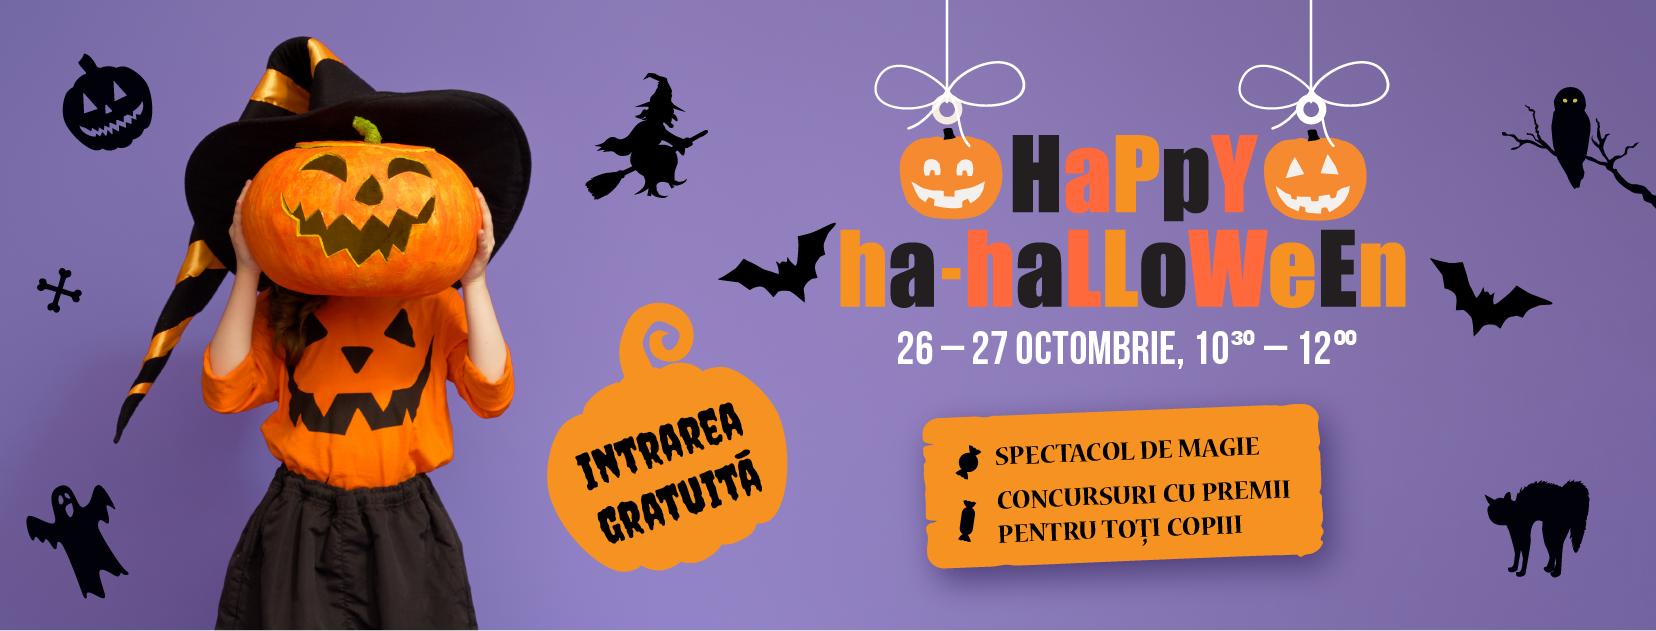 petrecere+halloween+copii+felicia+iasi